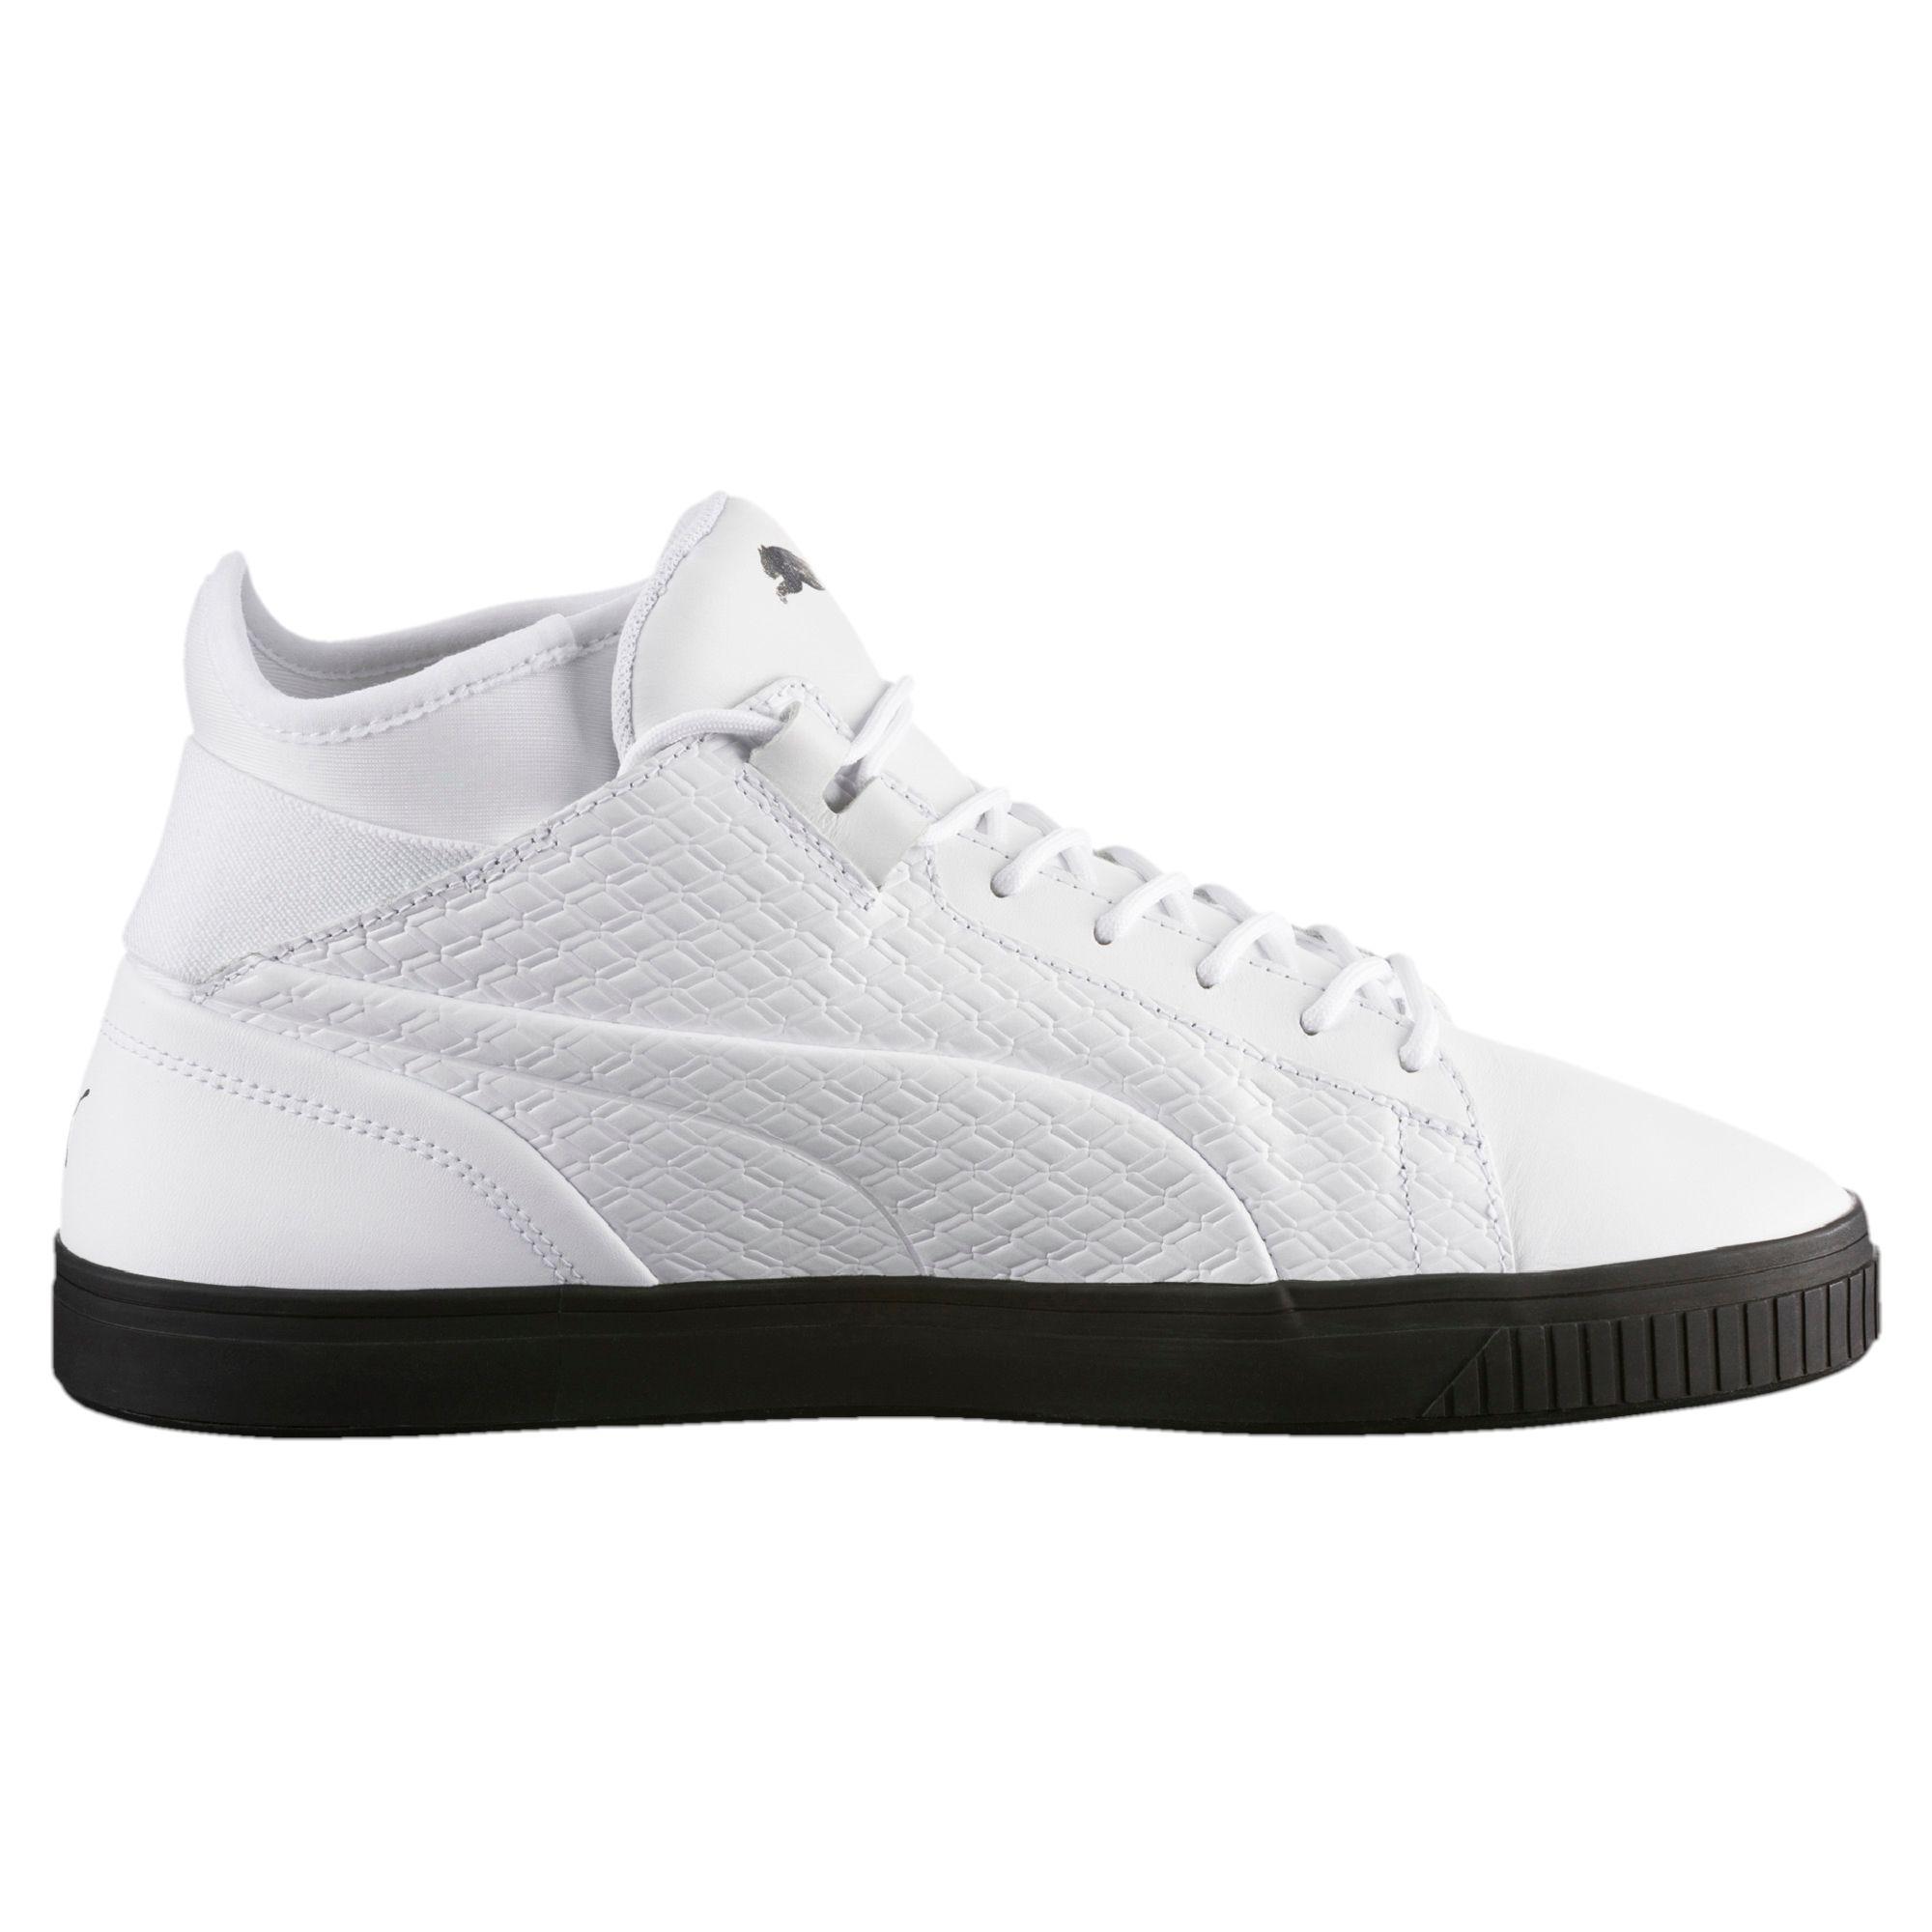 PUMA Evolution Play Black and White Sneaker Schuhe Männer Neu